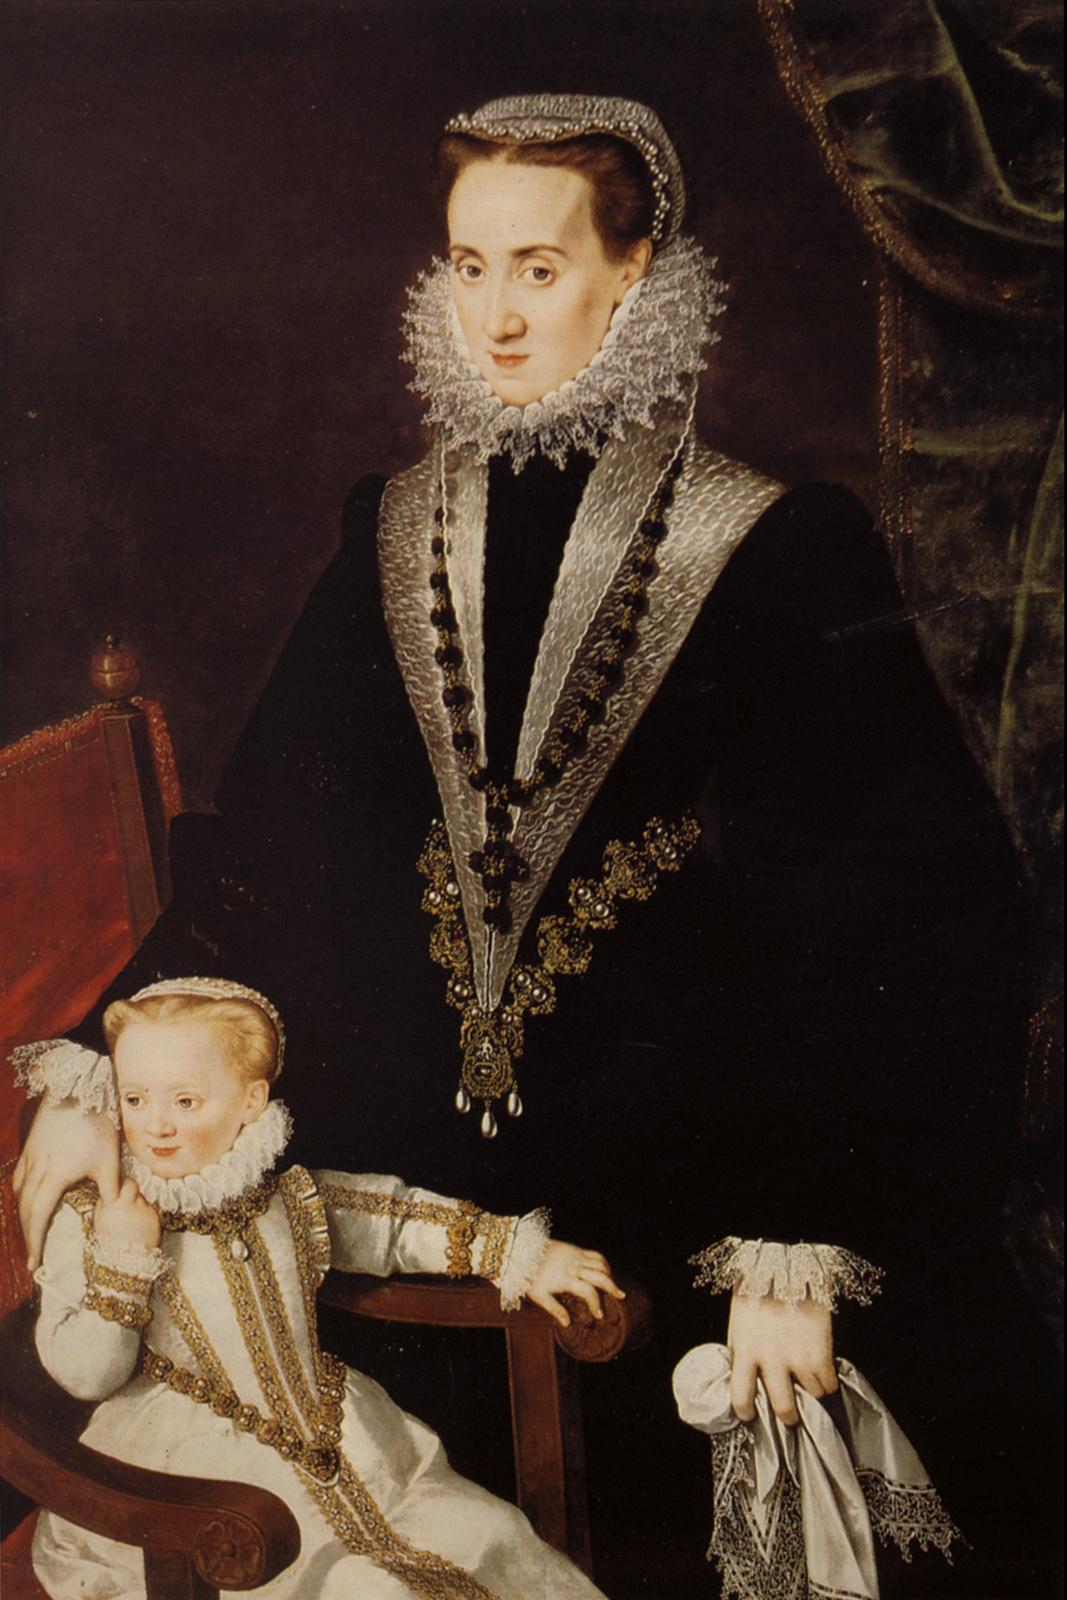 Sofonisba Anguissola. Dona Maria Manrique de Lara with her daughter